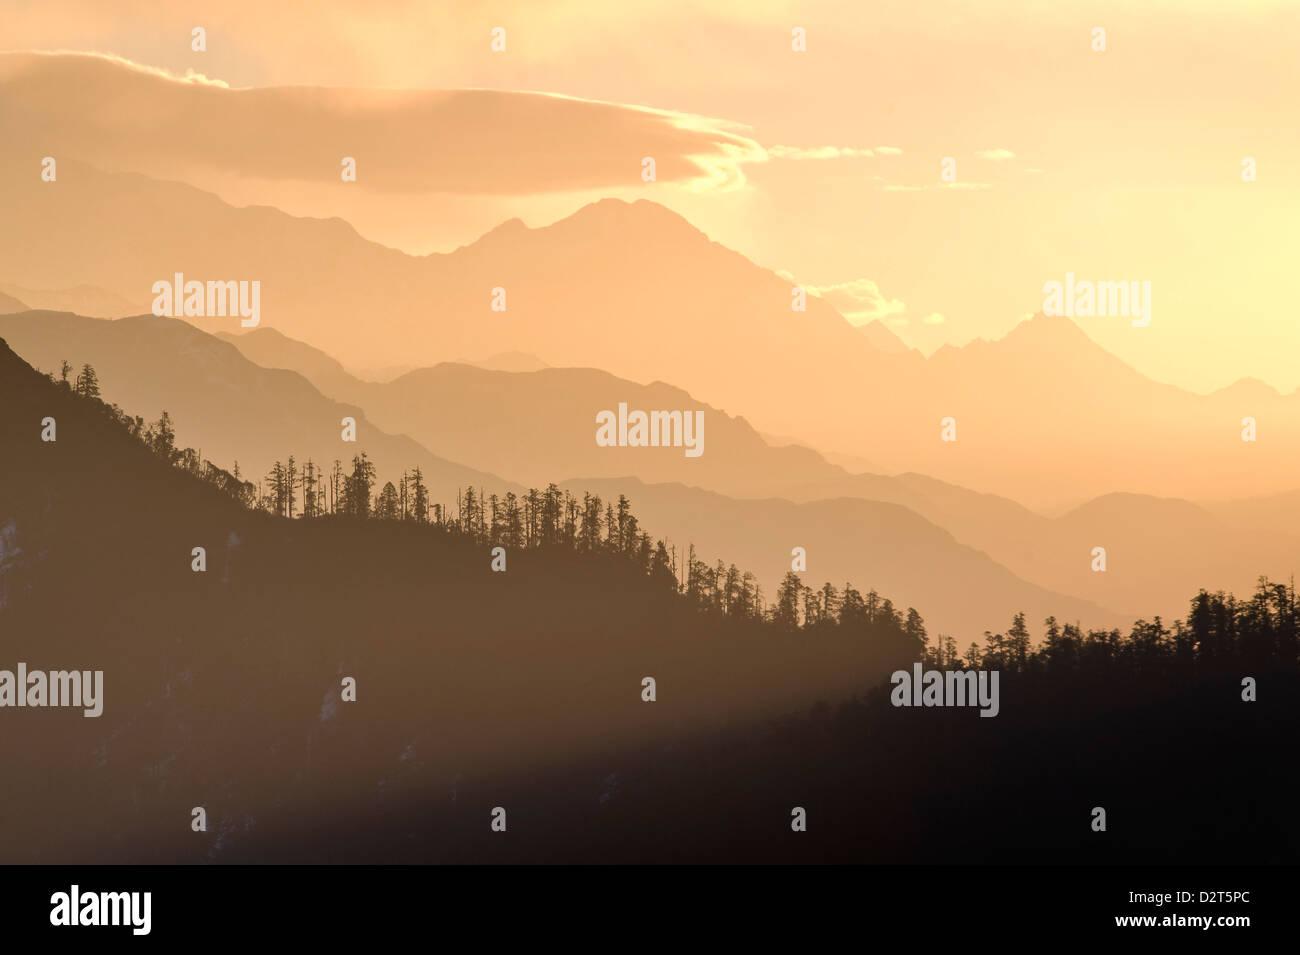 View from Poon Hilll at dawn, Ghorepani, Annapurna Himal, Nepal, Himalayas, Asia - Stock Image